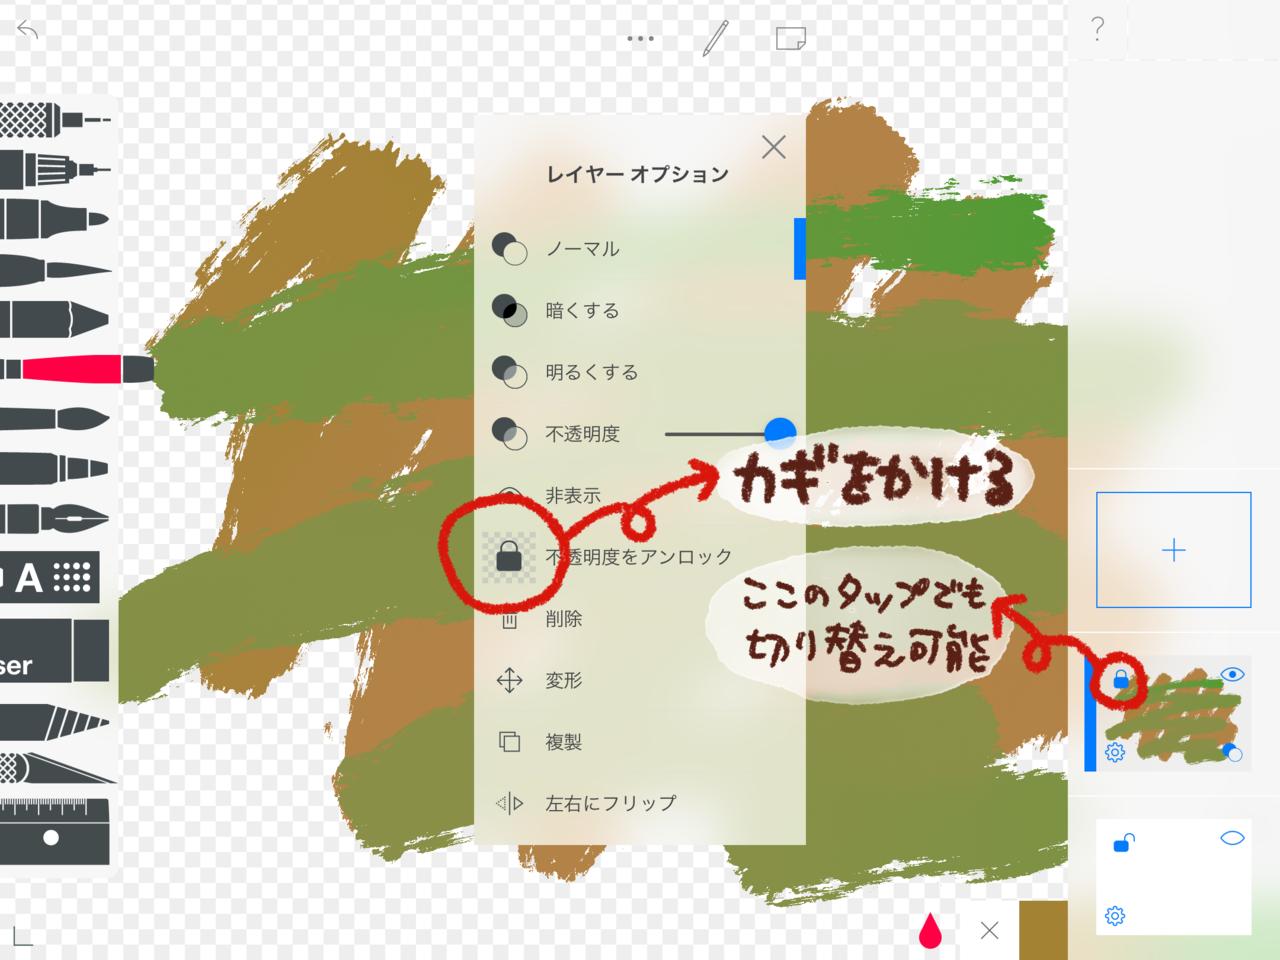 f:id:Imamura:20200421002839p:plain